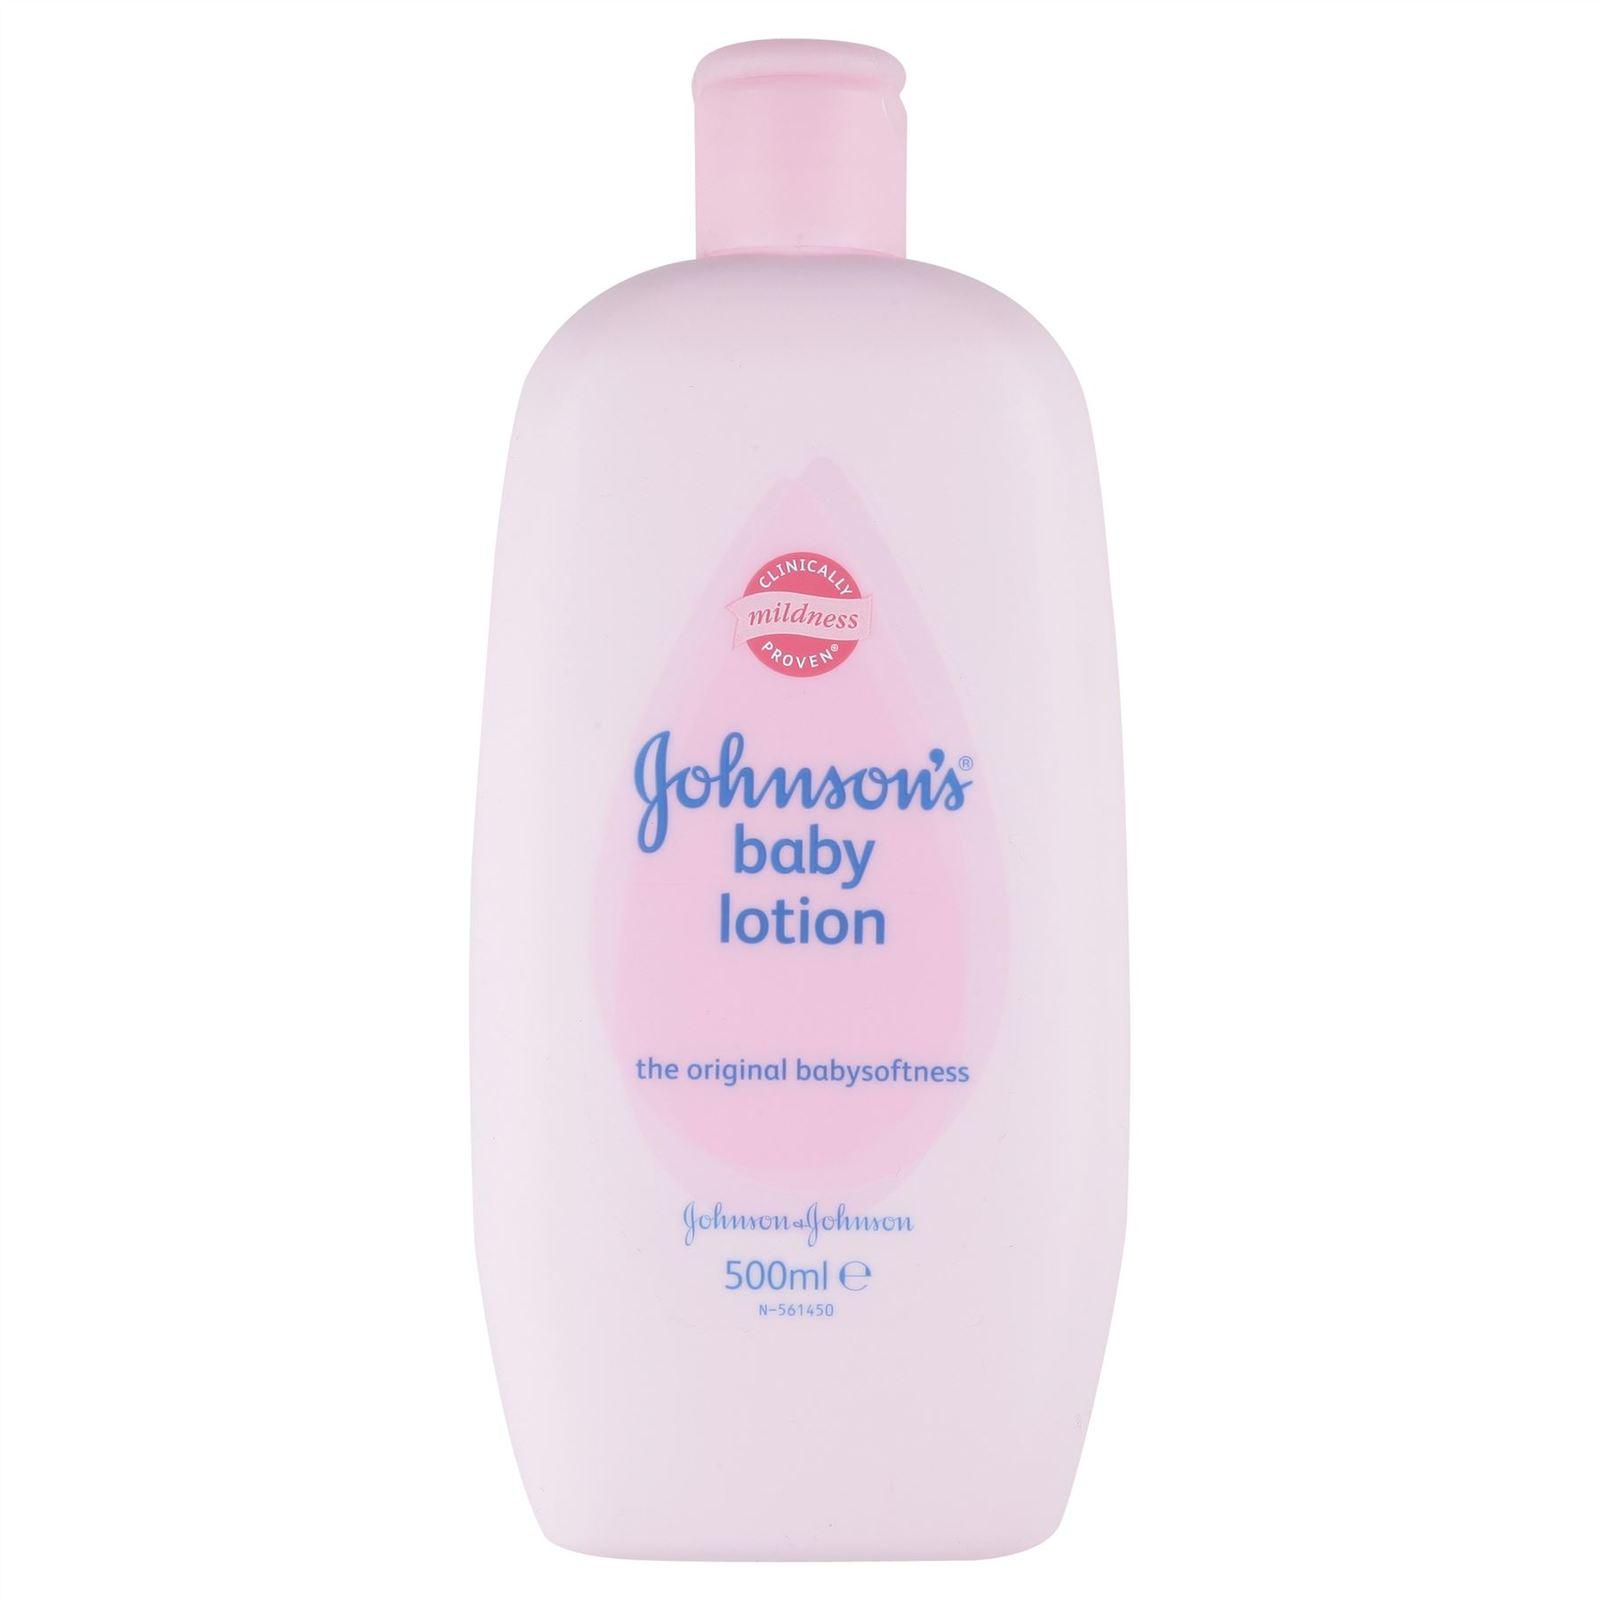 Johnson's Baby Lotion (500ml) image